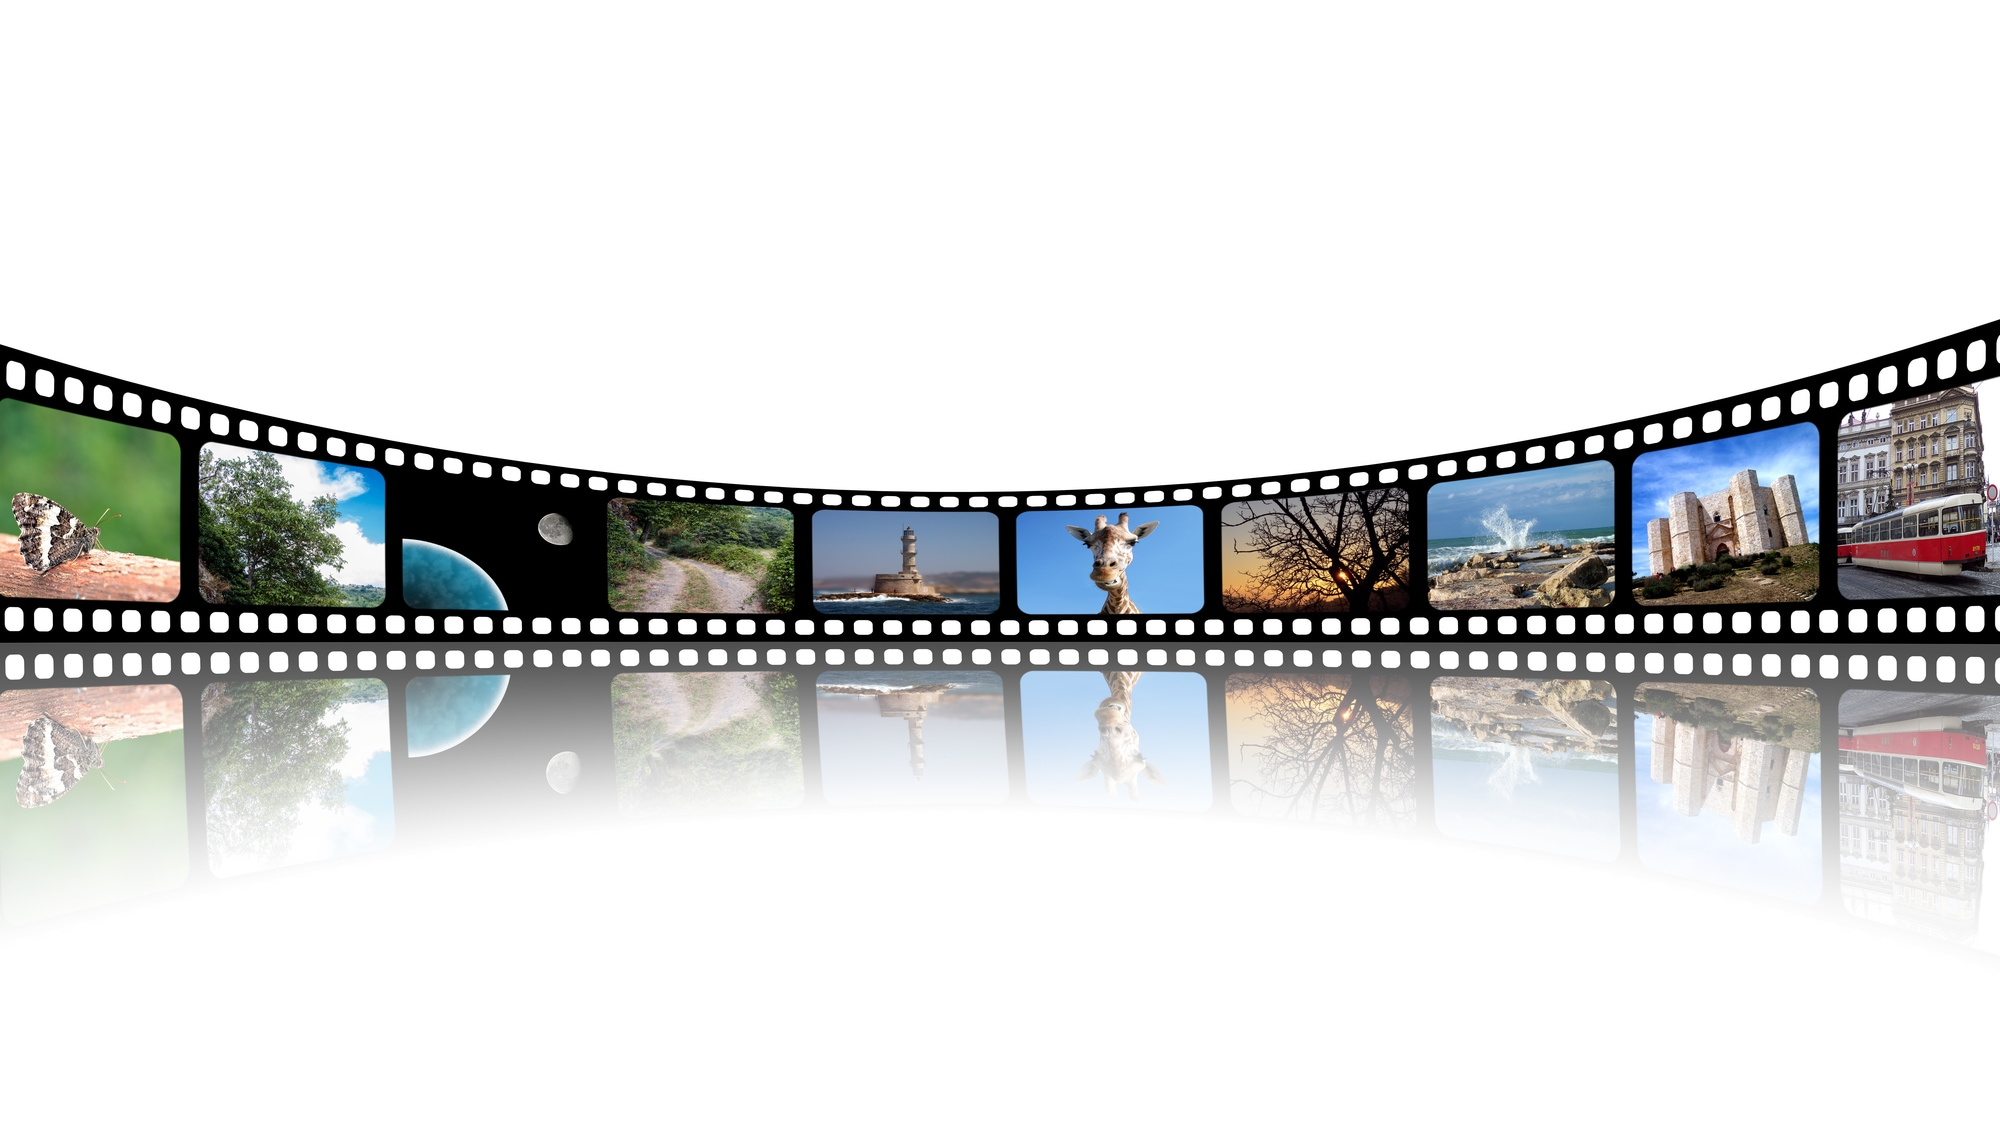 a film strip of video frames